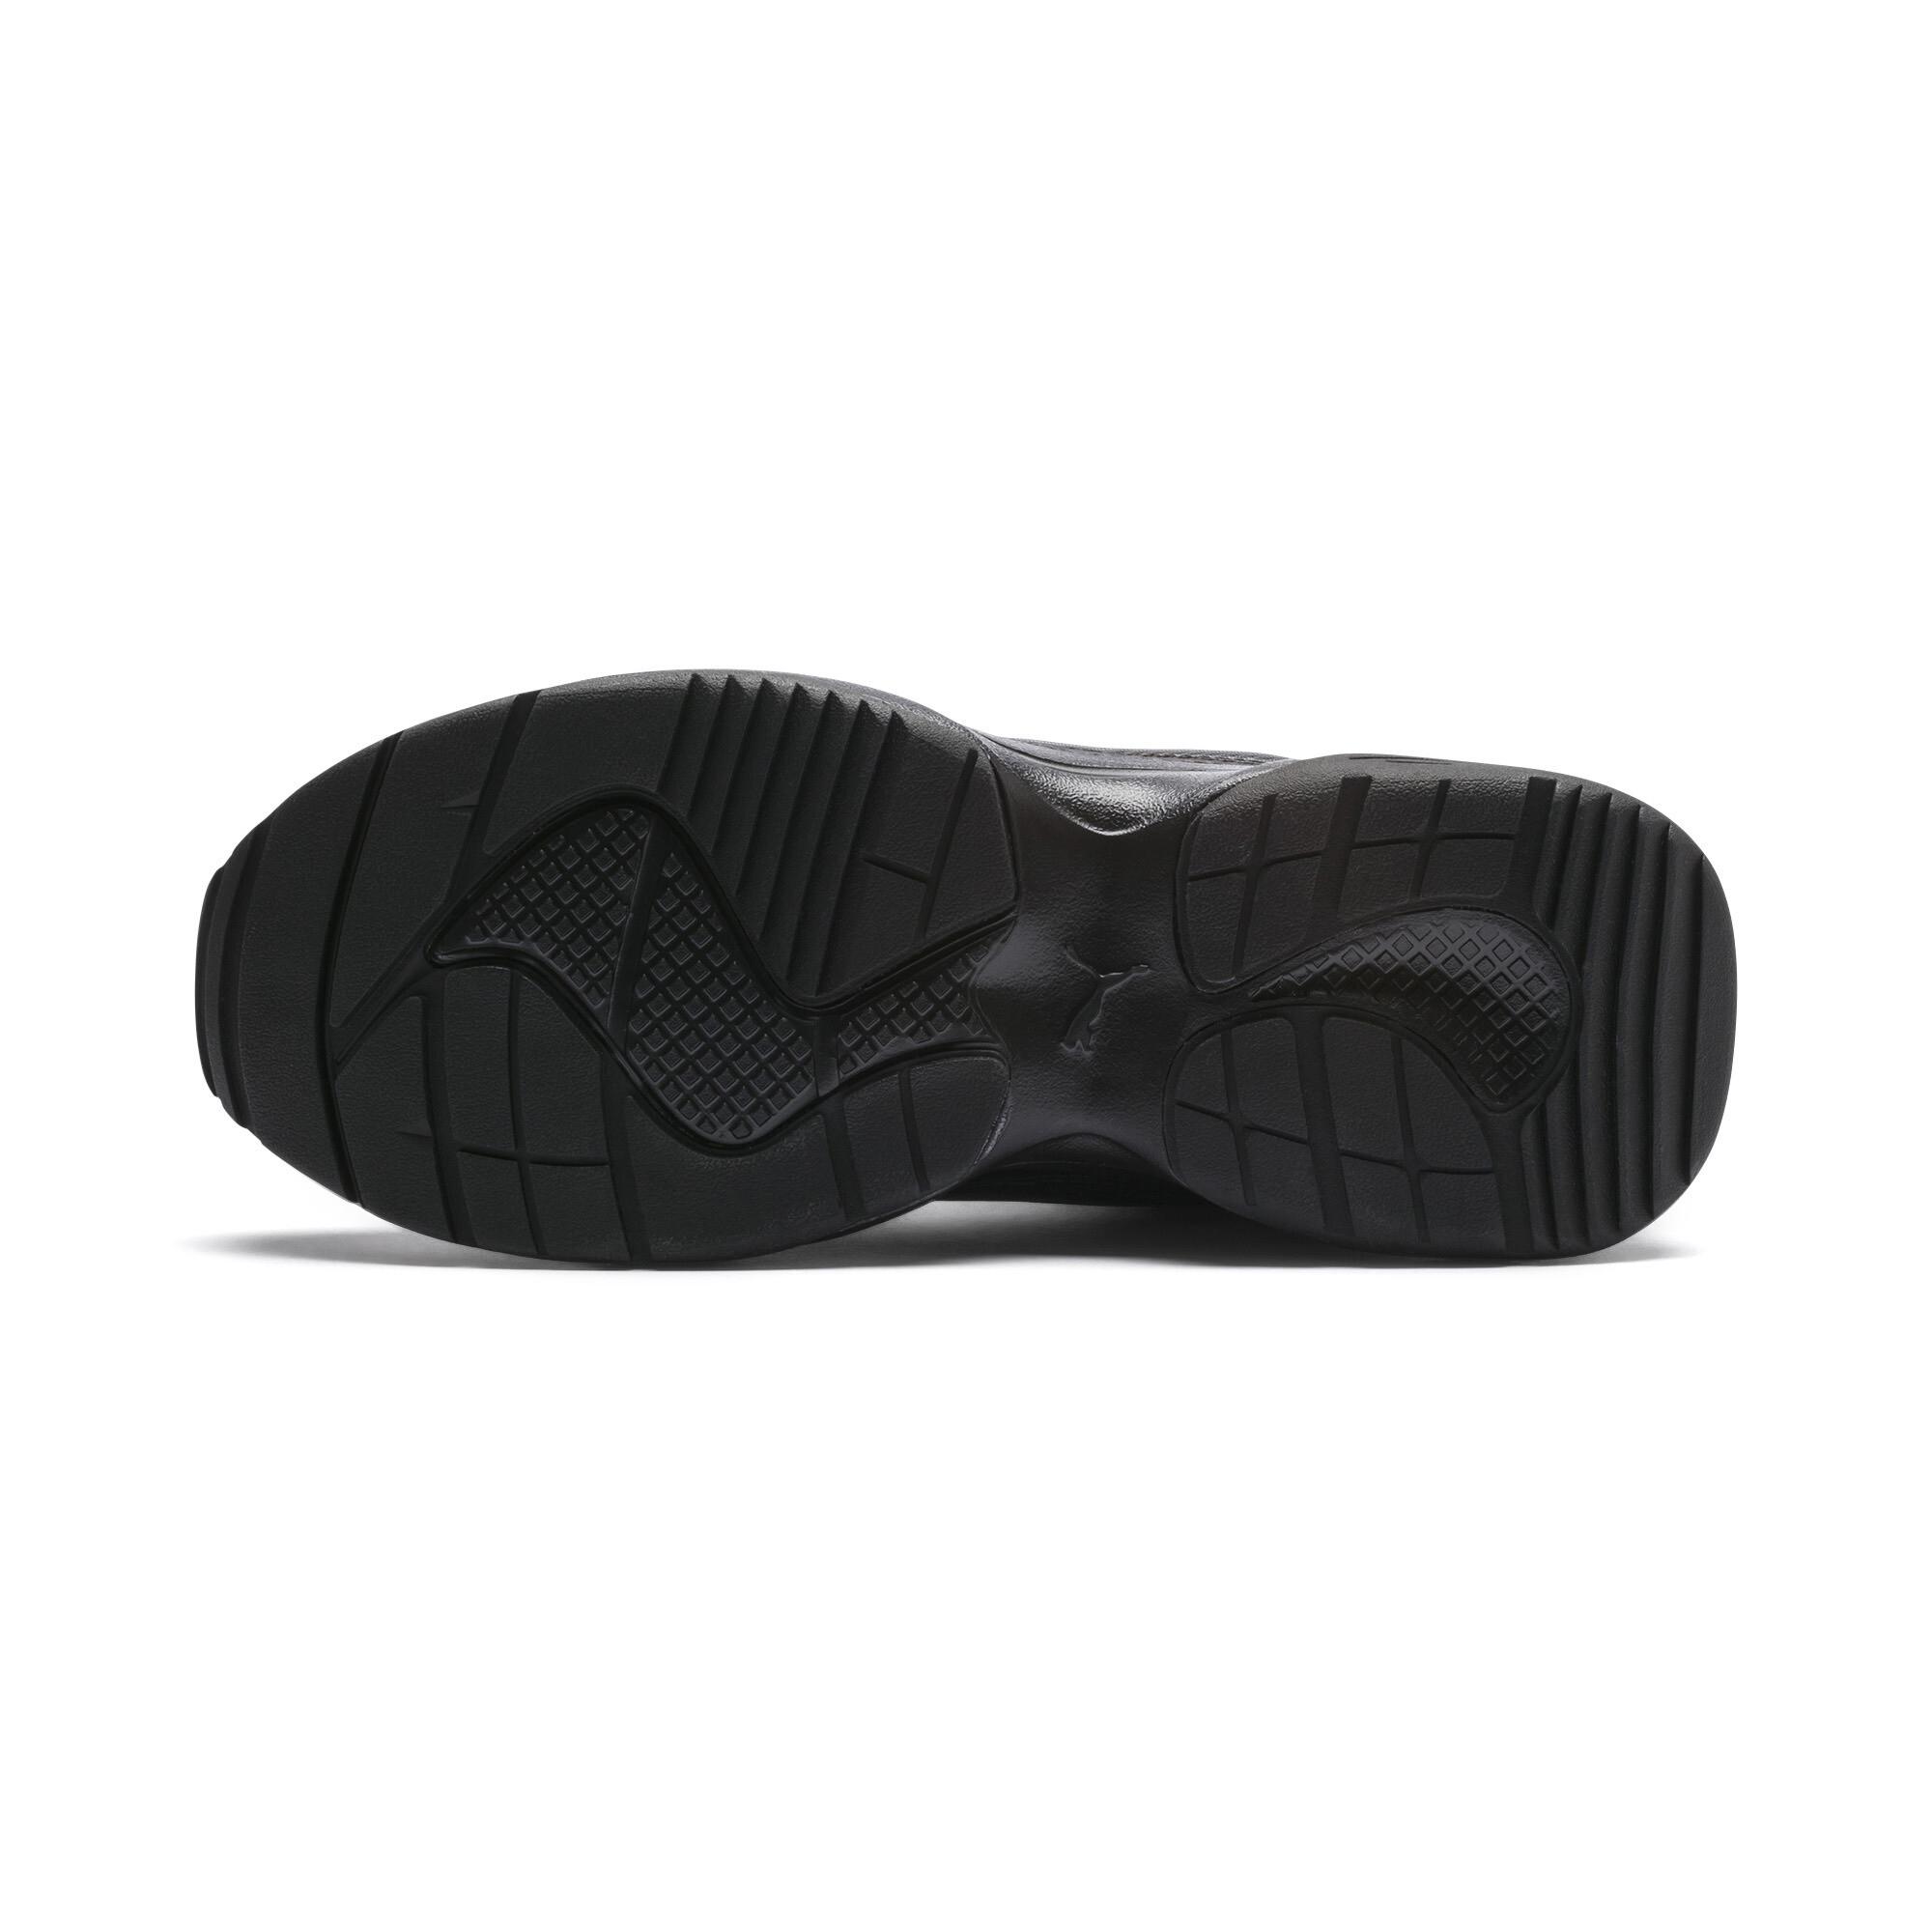 PUMA-Cilia-Women-039-s-Sneakers-Women-Shoe-Basics thumbnail 11